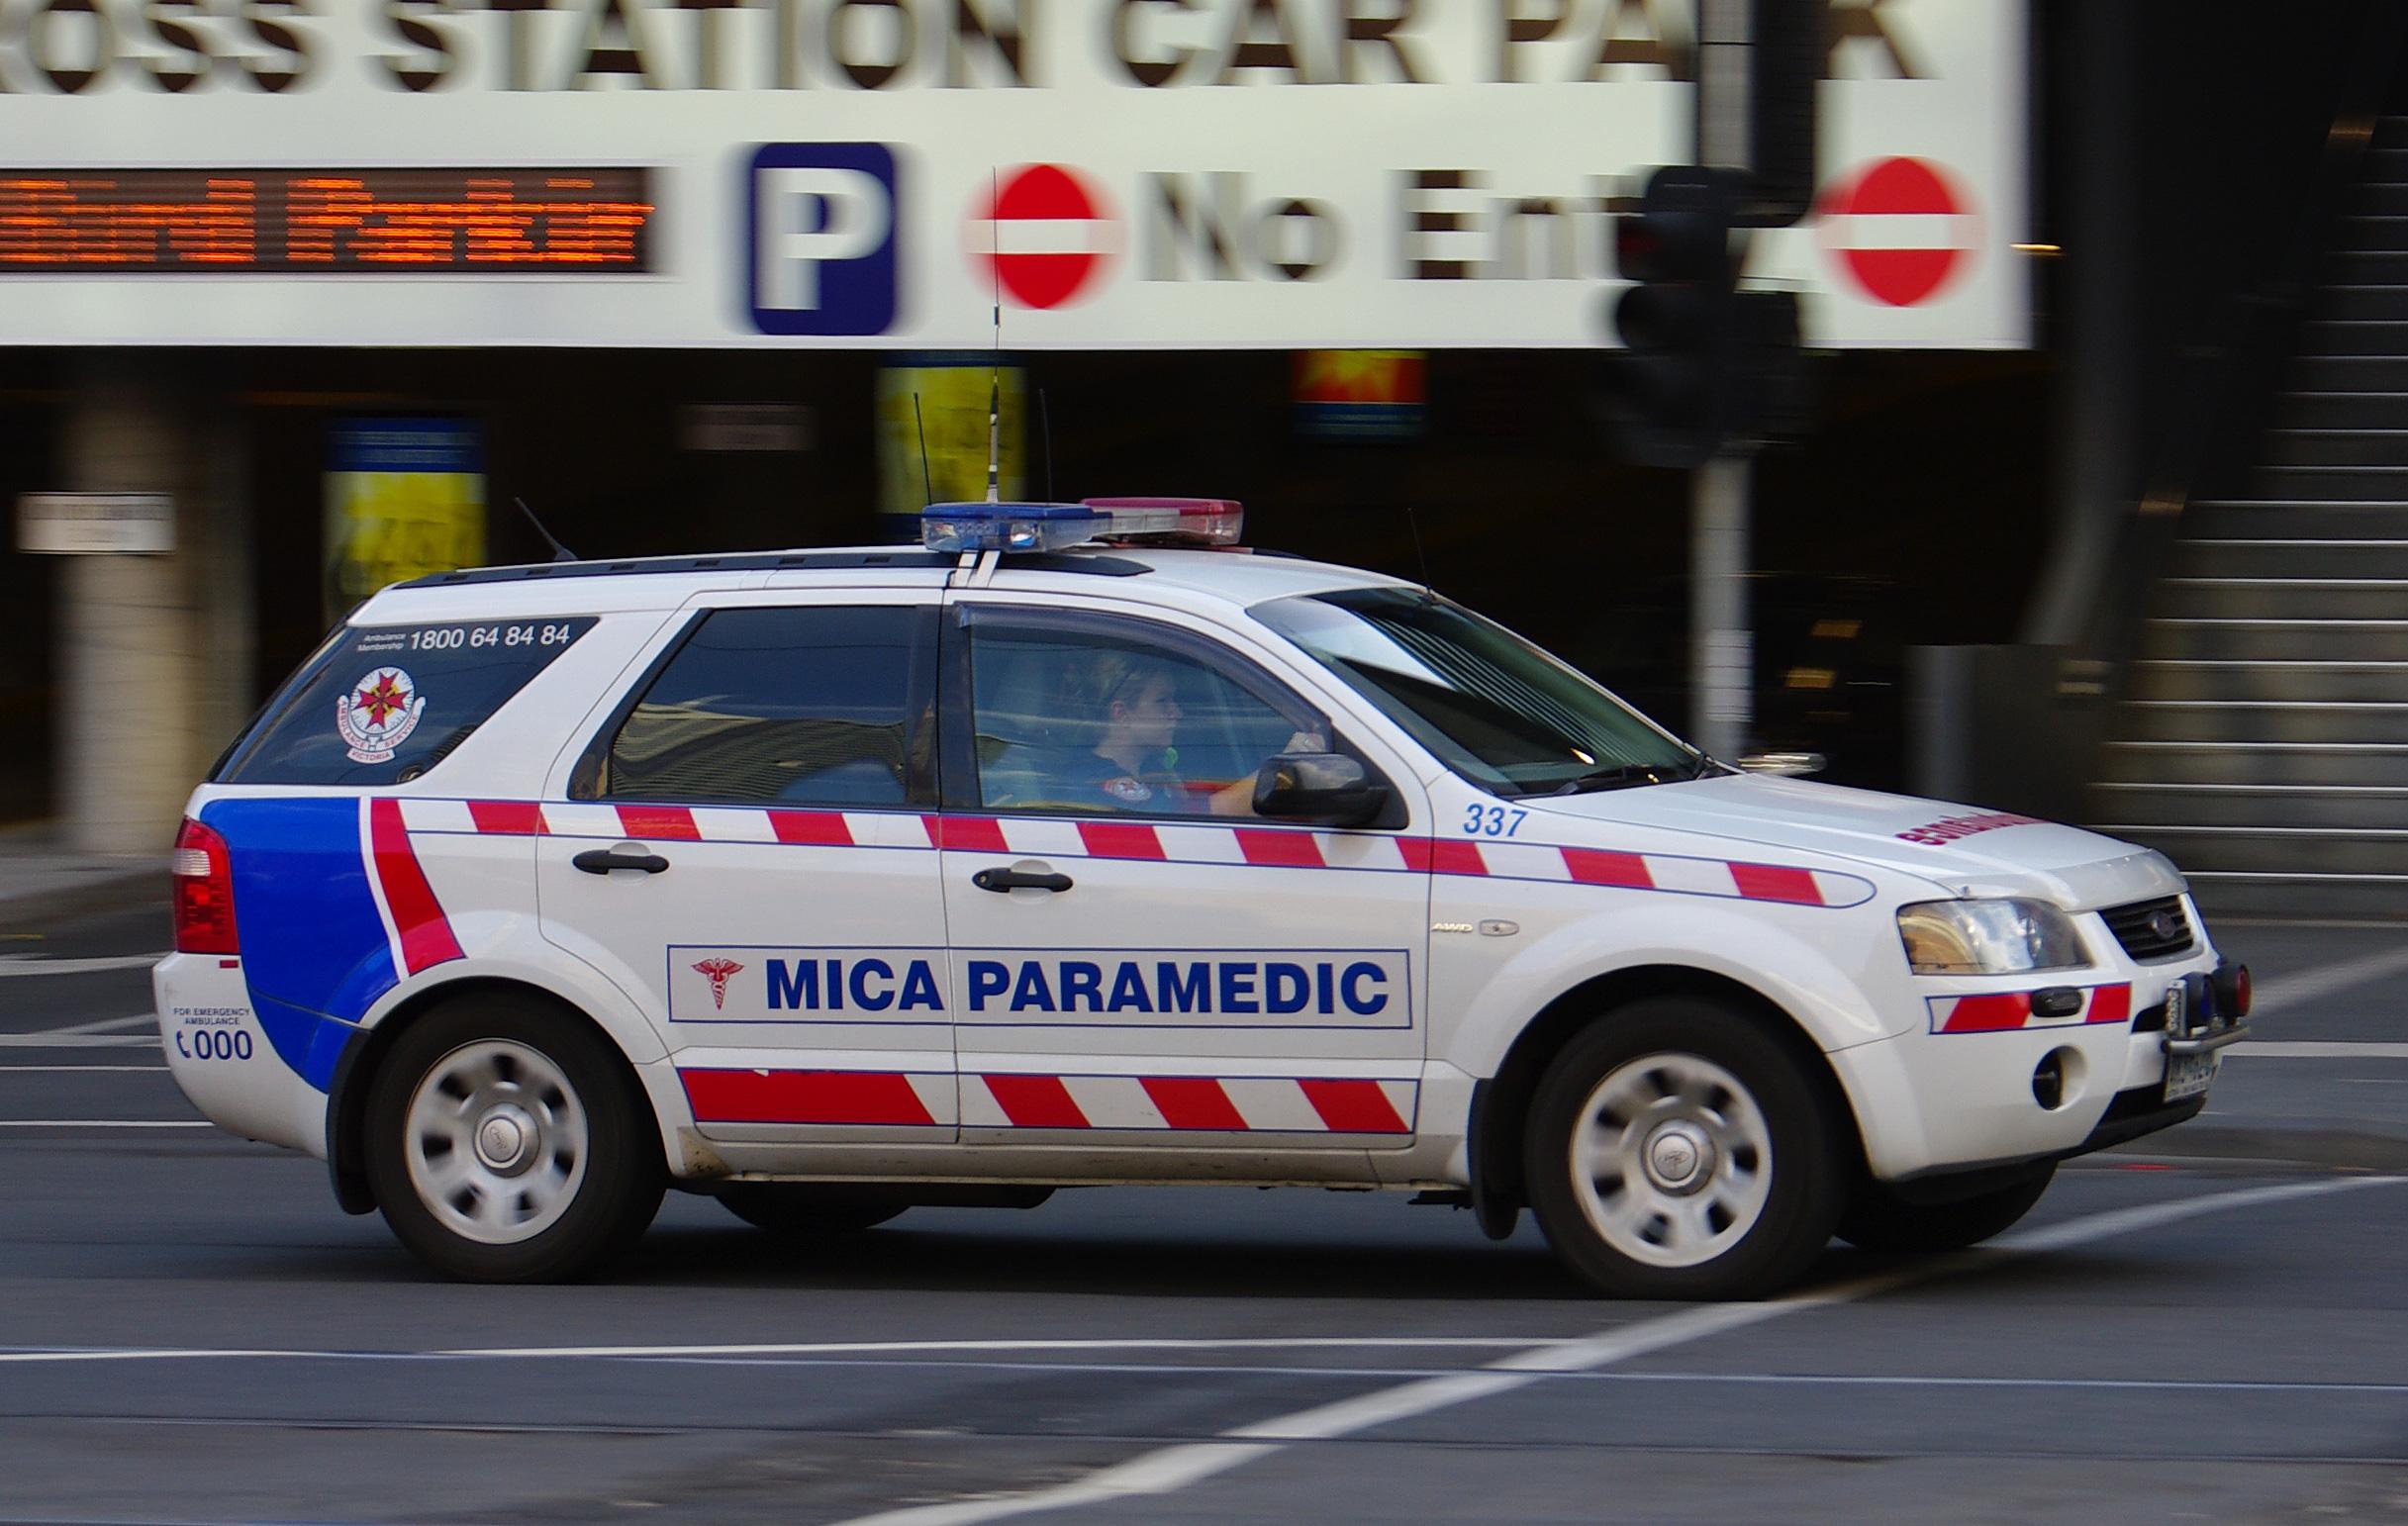 Mobile Intensive Care Ambulance Wikipedia